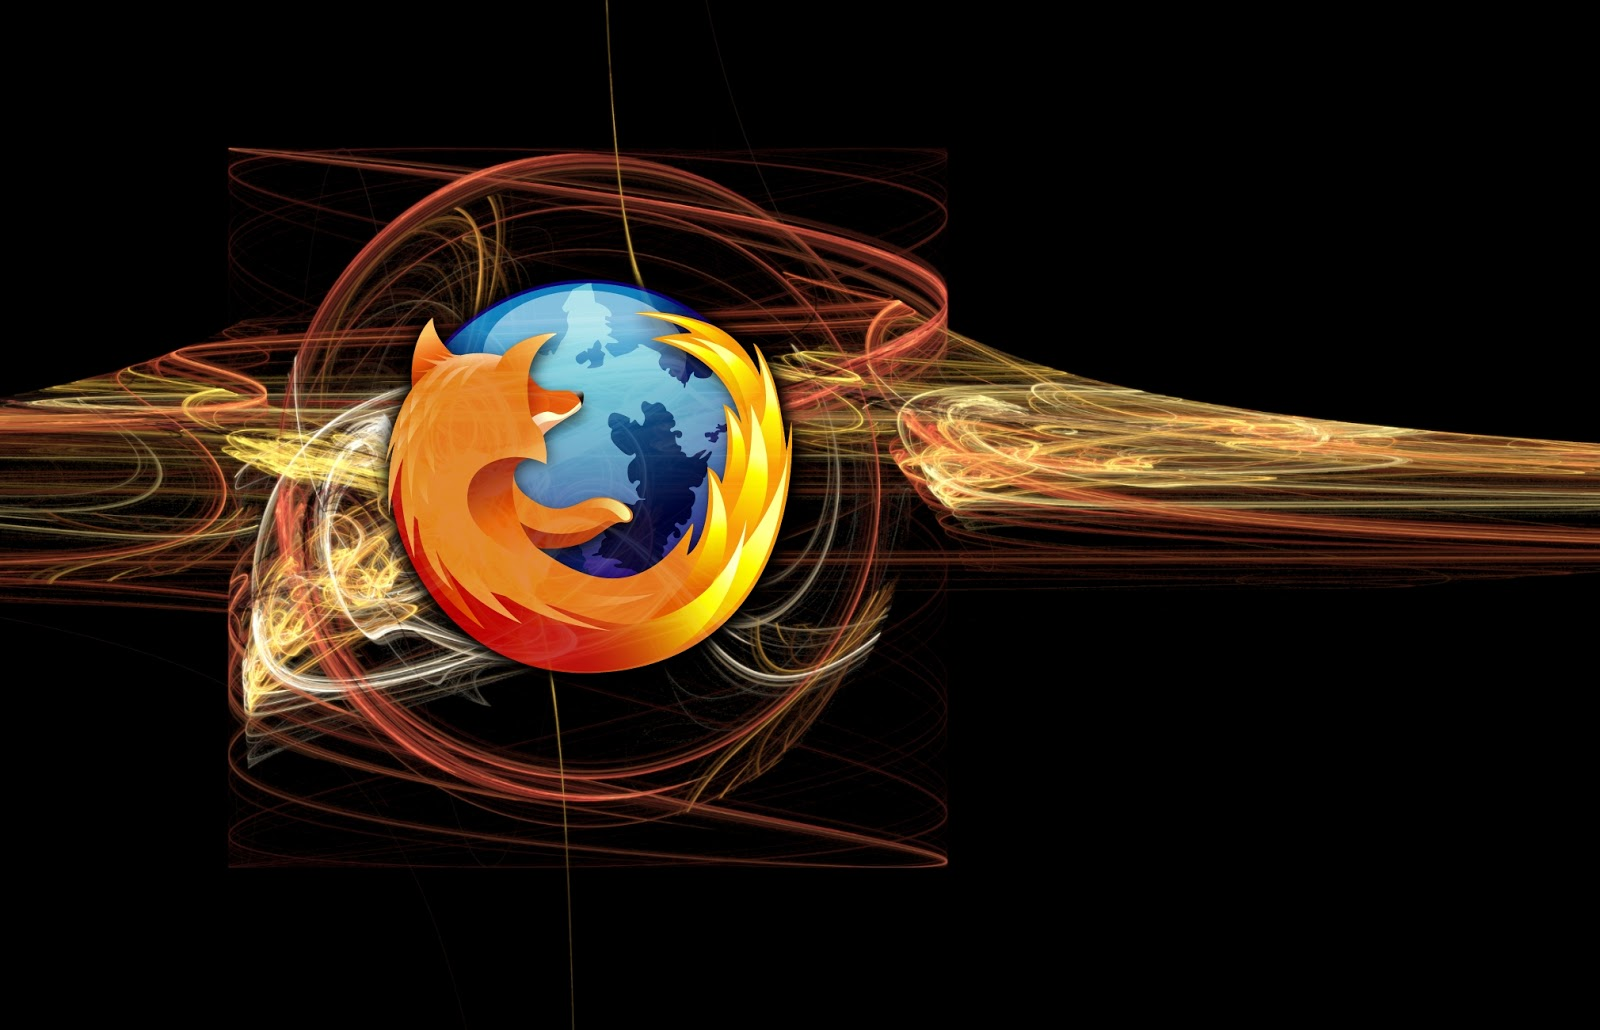 Mozilla Wallpaper Desktop - WallpaperSafari